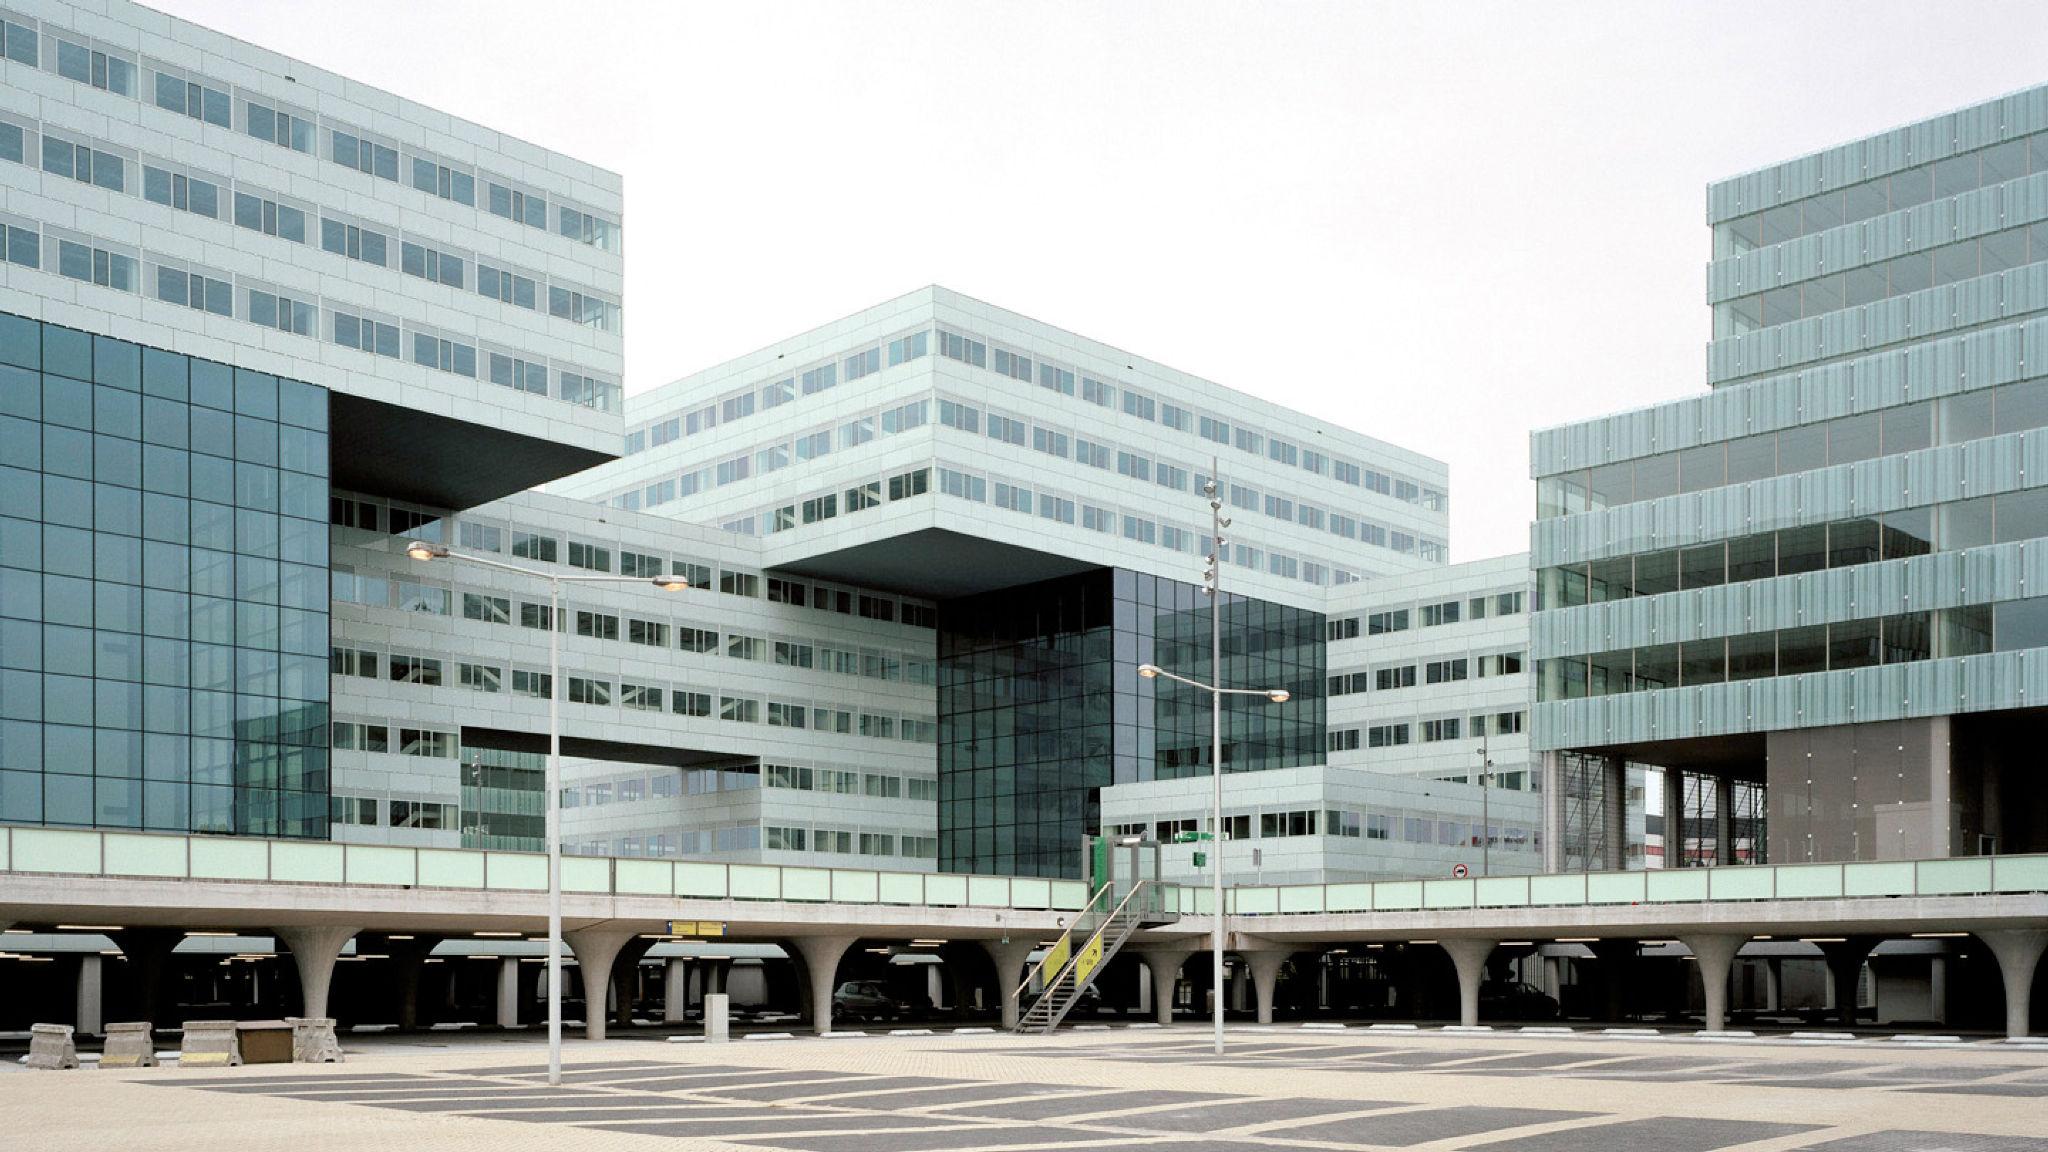 KCAP Architects & Planners Hilde Remøy Stream 02 PCA-STREAM